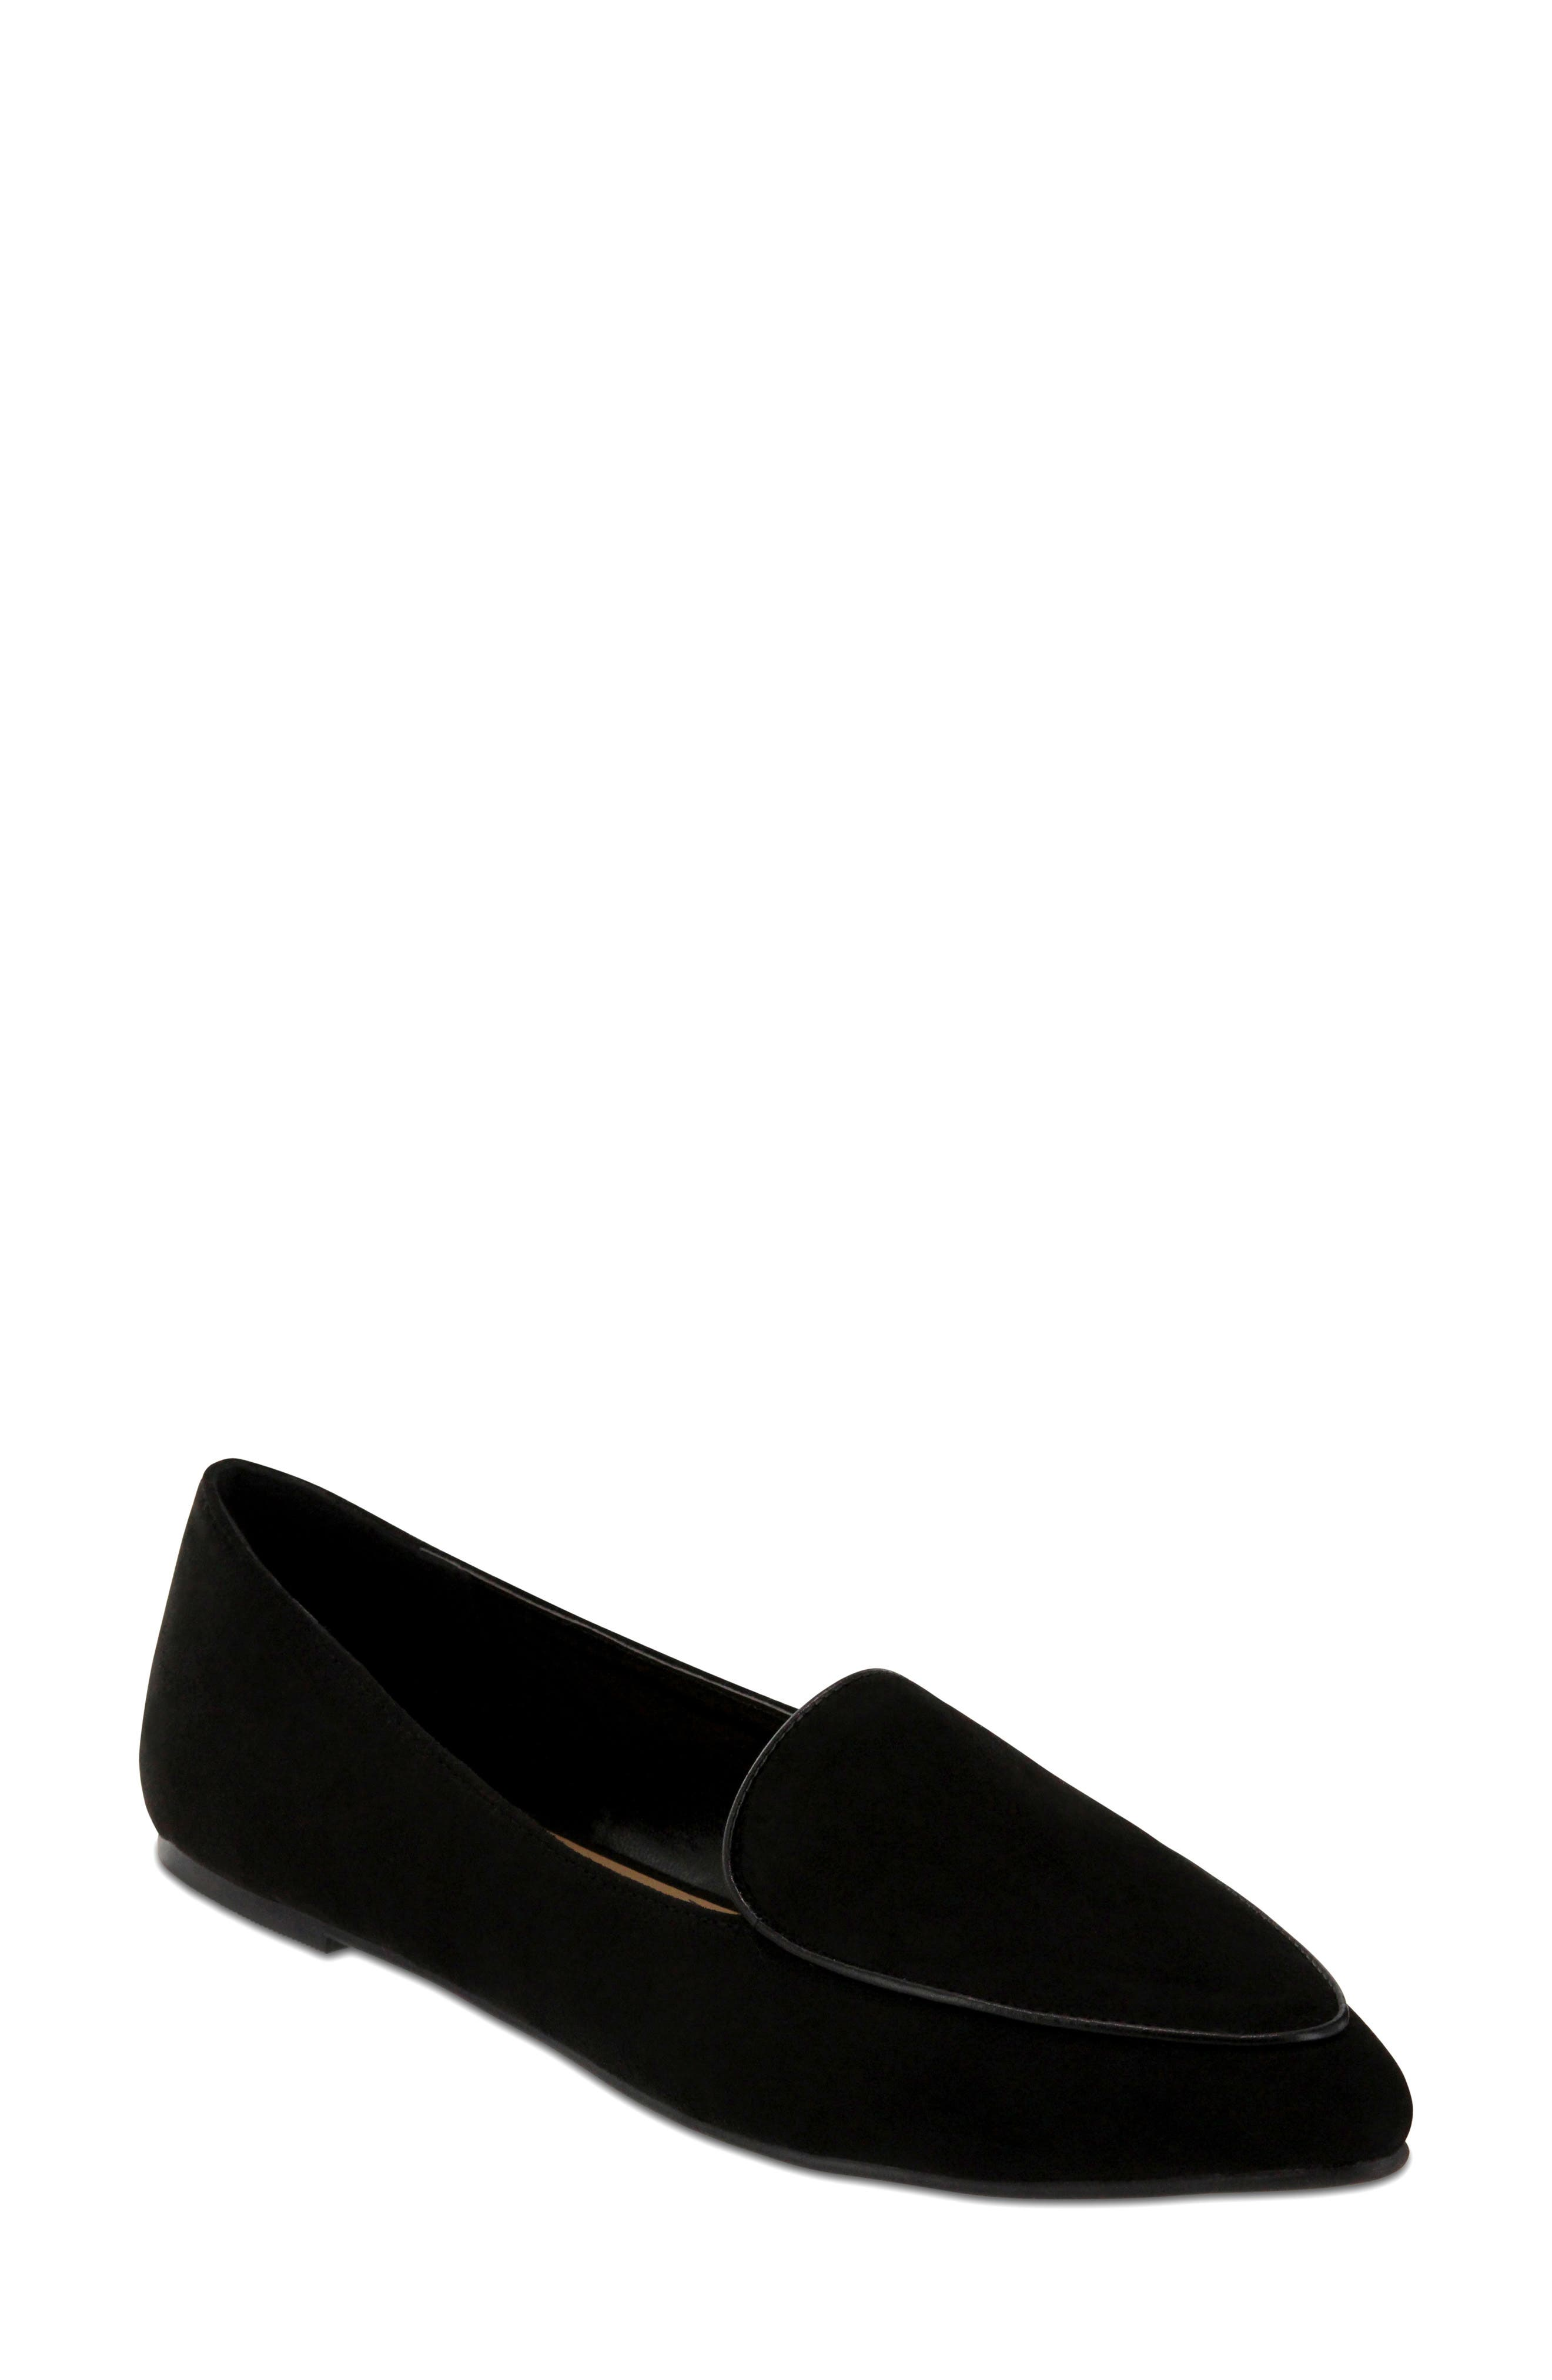 Niles Loafer,                         Main,                         color, Black